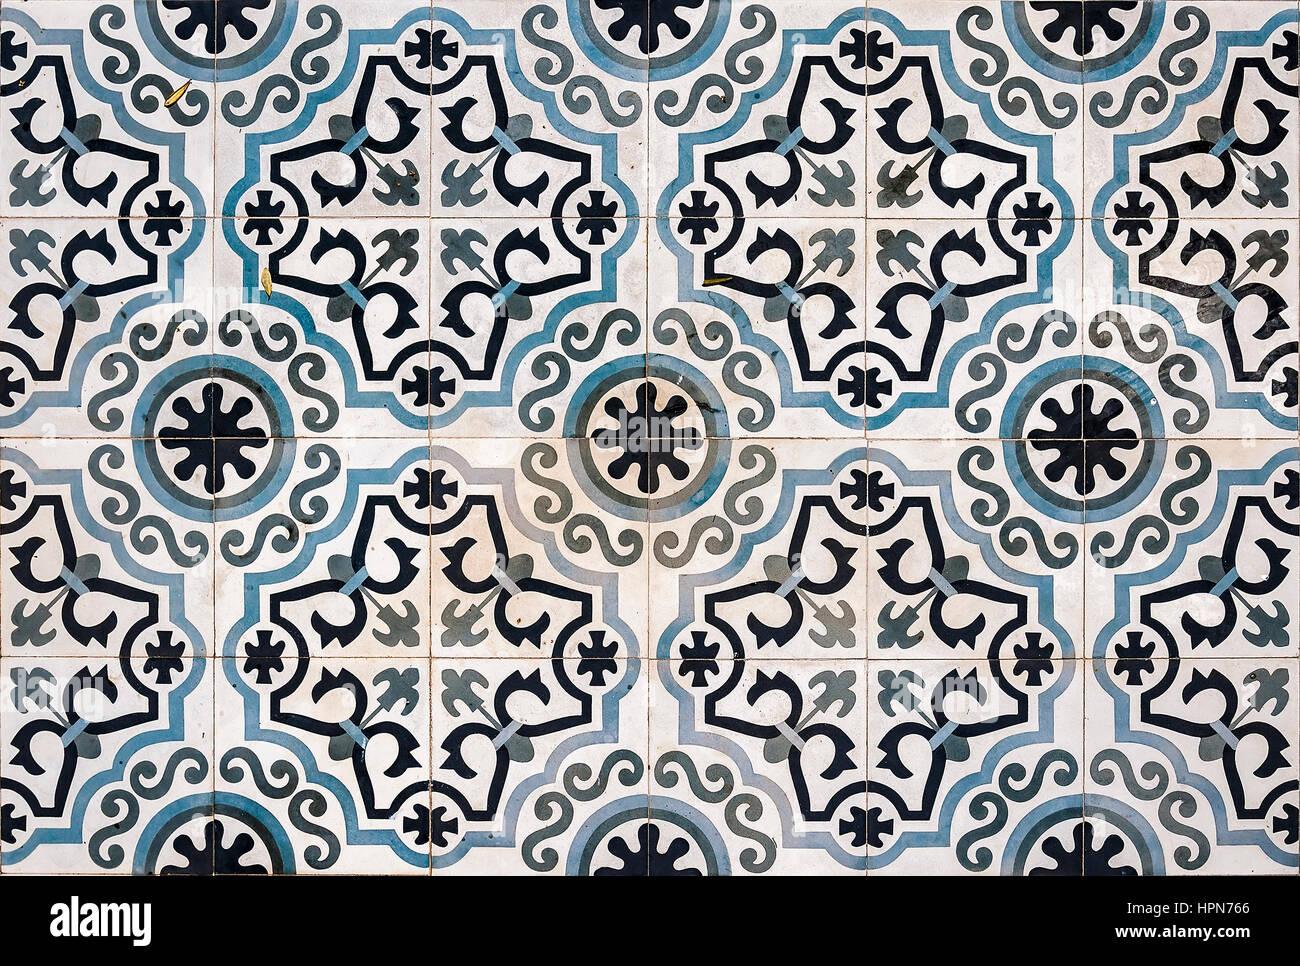 Ornate ceramic floor tiles from a property in Lerapetra, Crete. - Stock Image